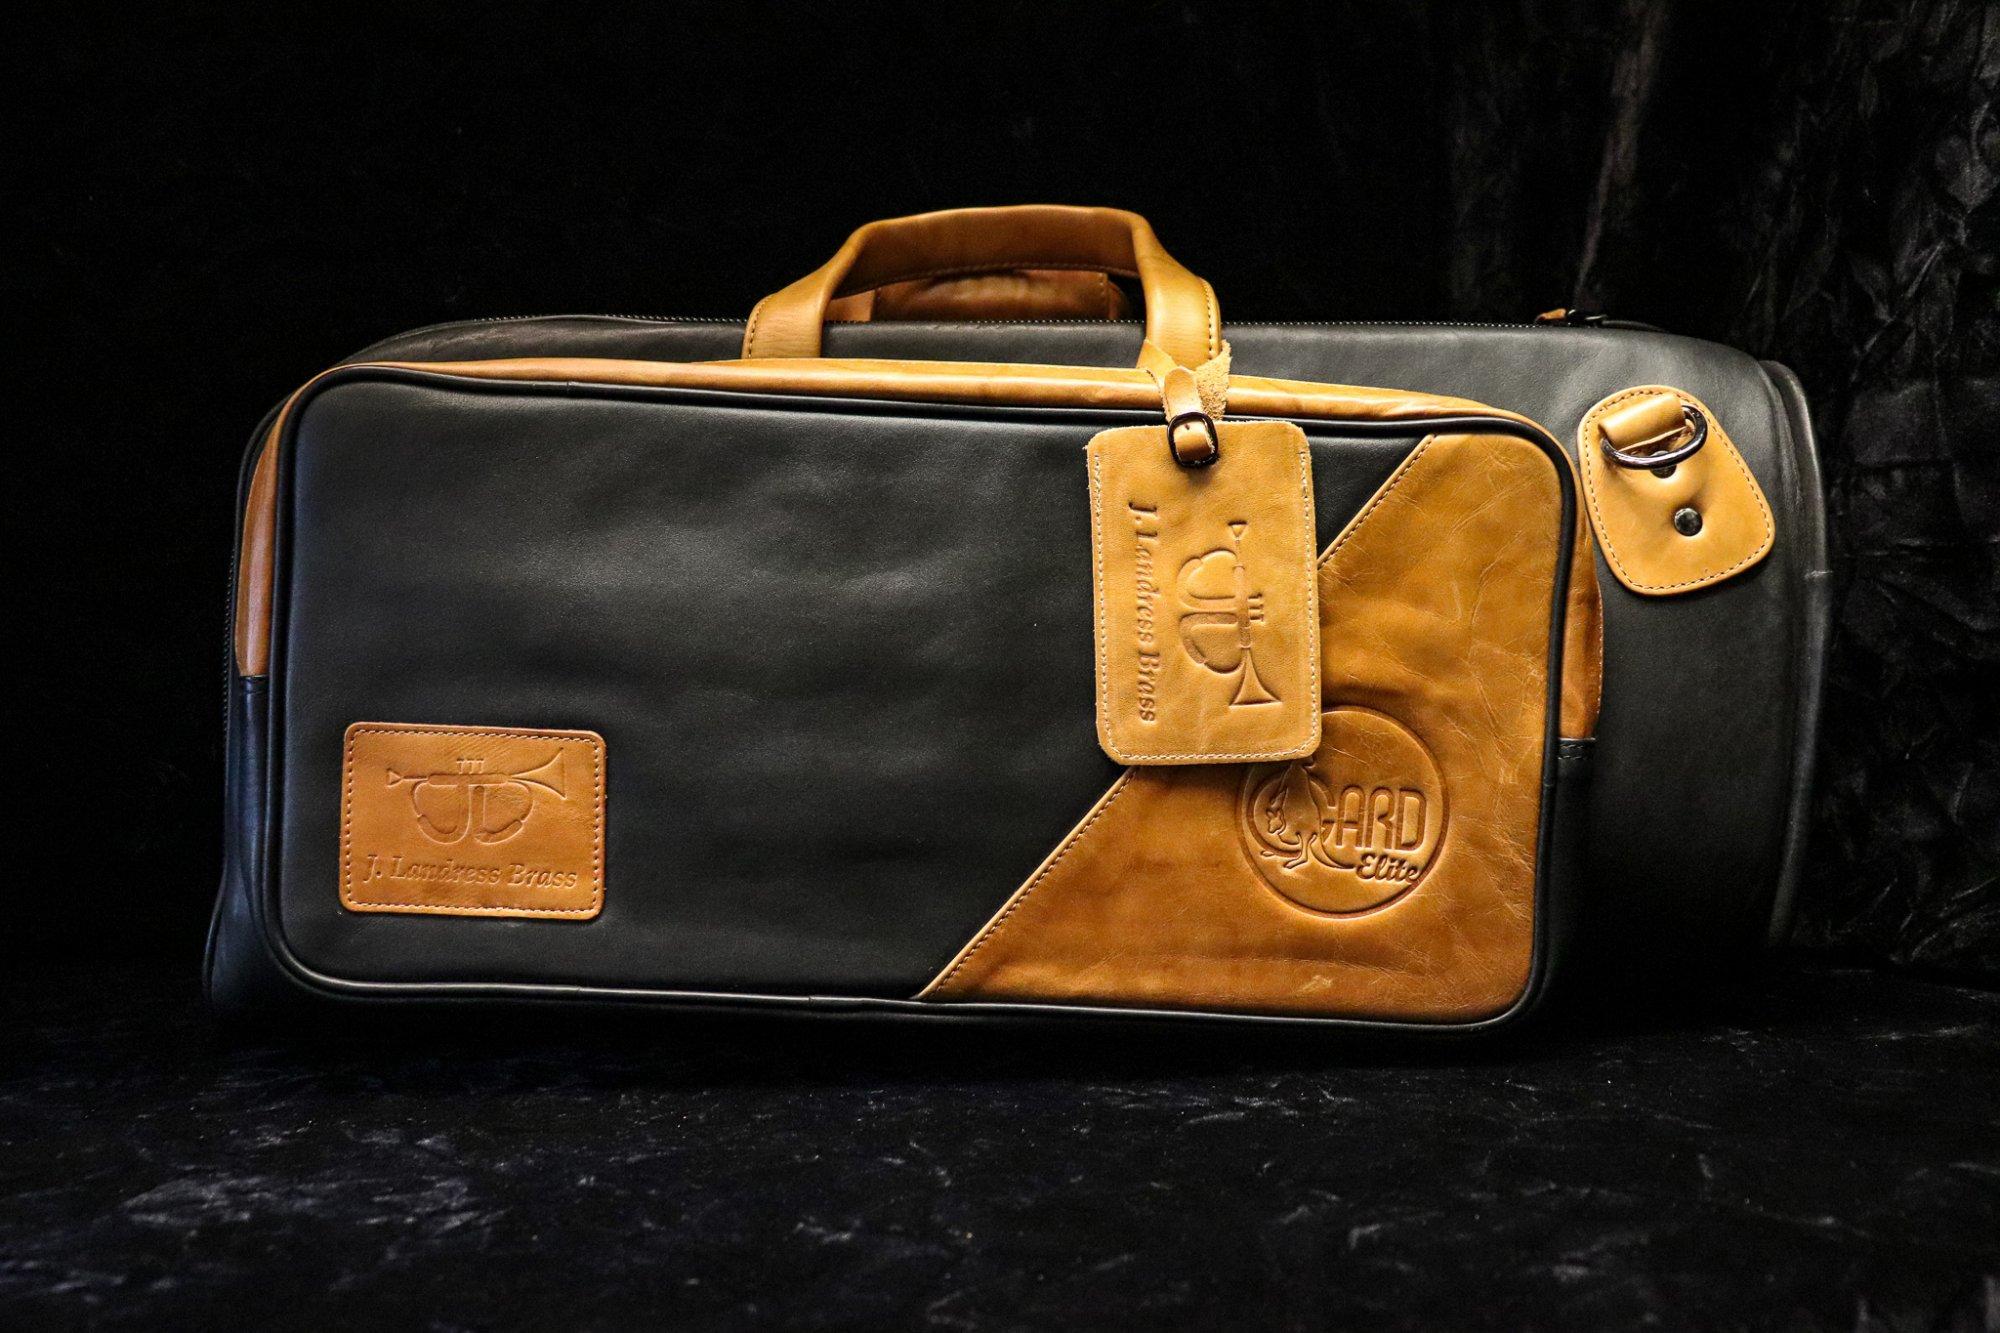 Gard Elite Trumpet/Flugel Leather